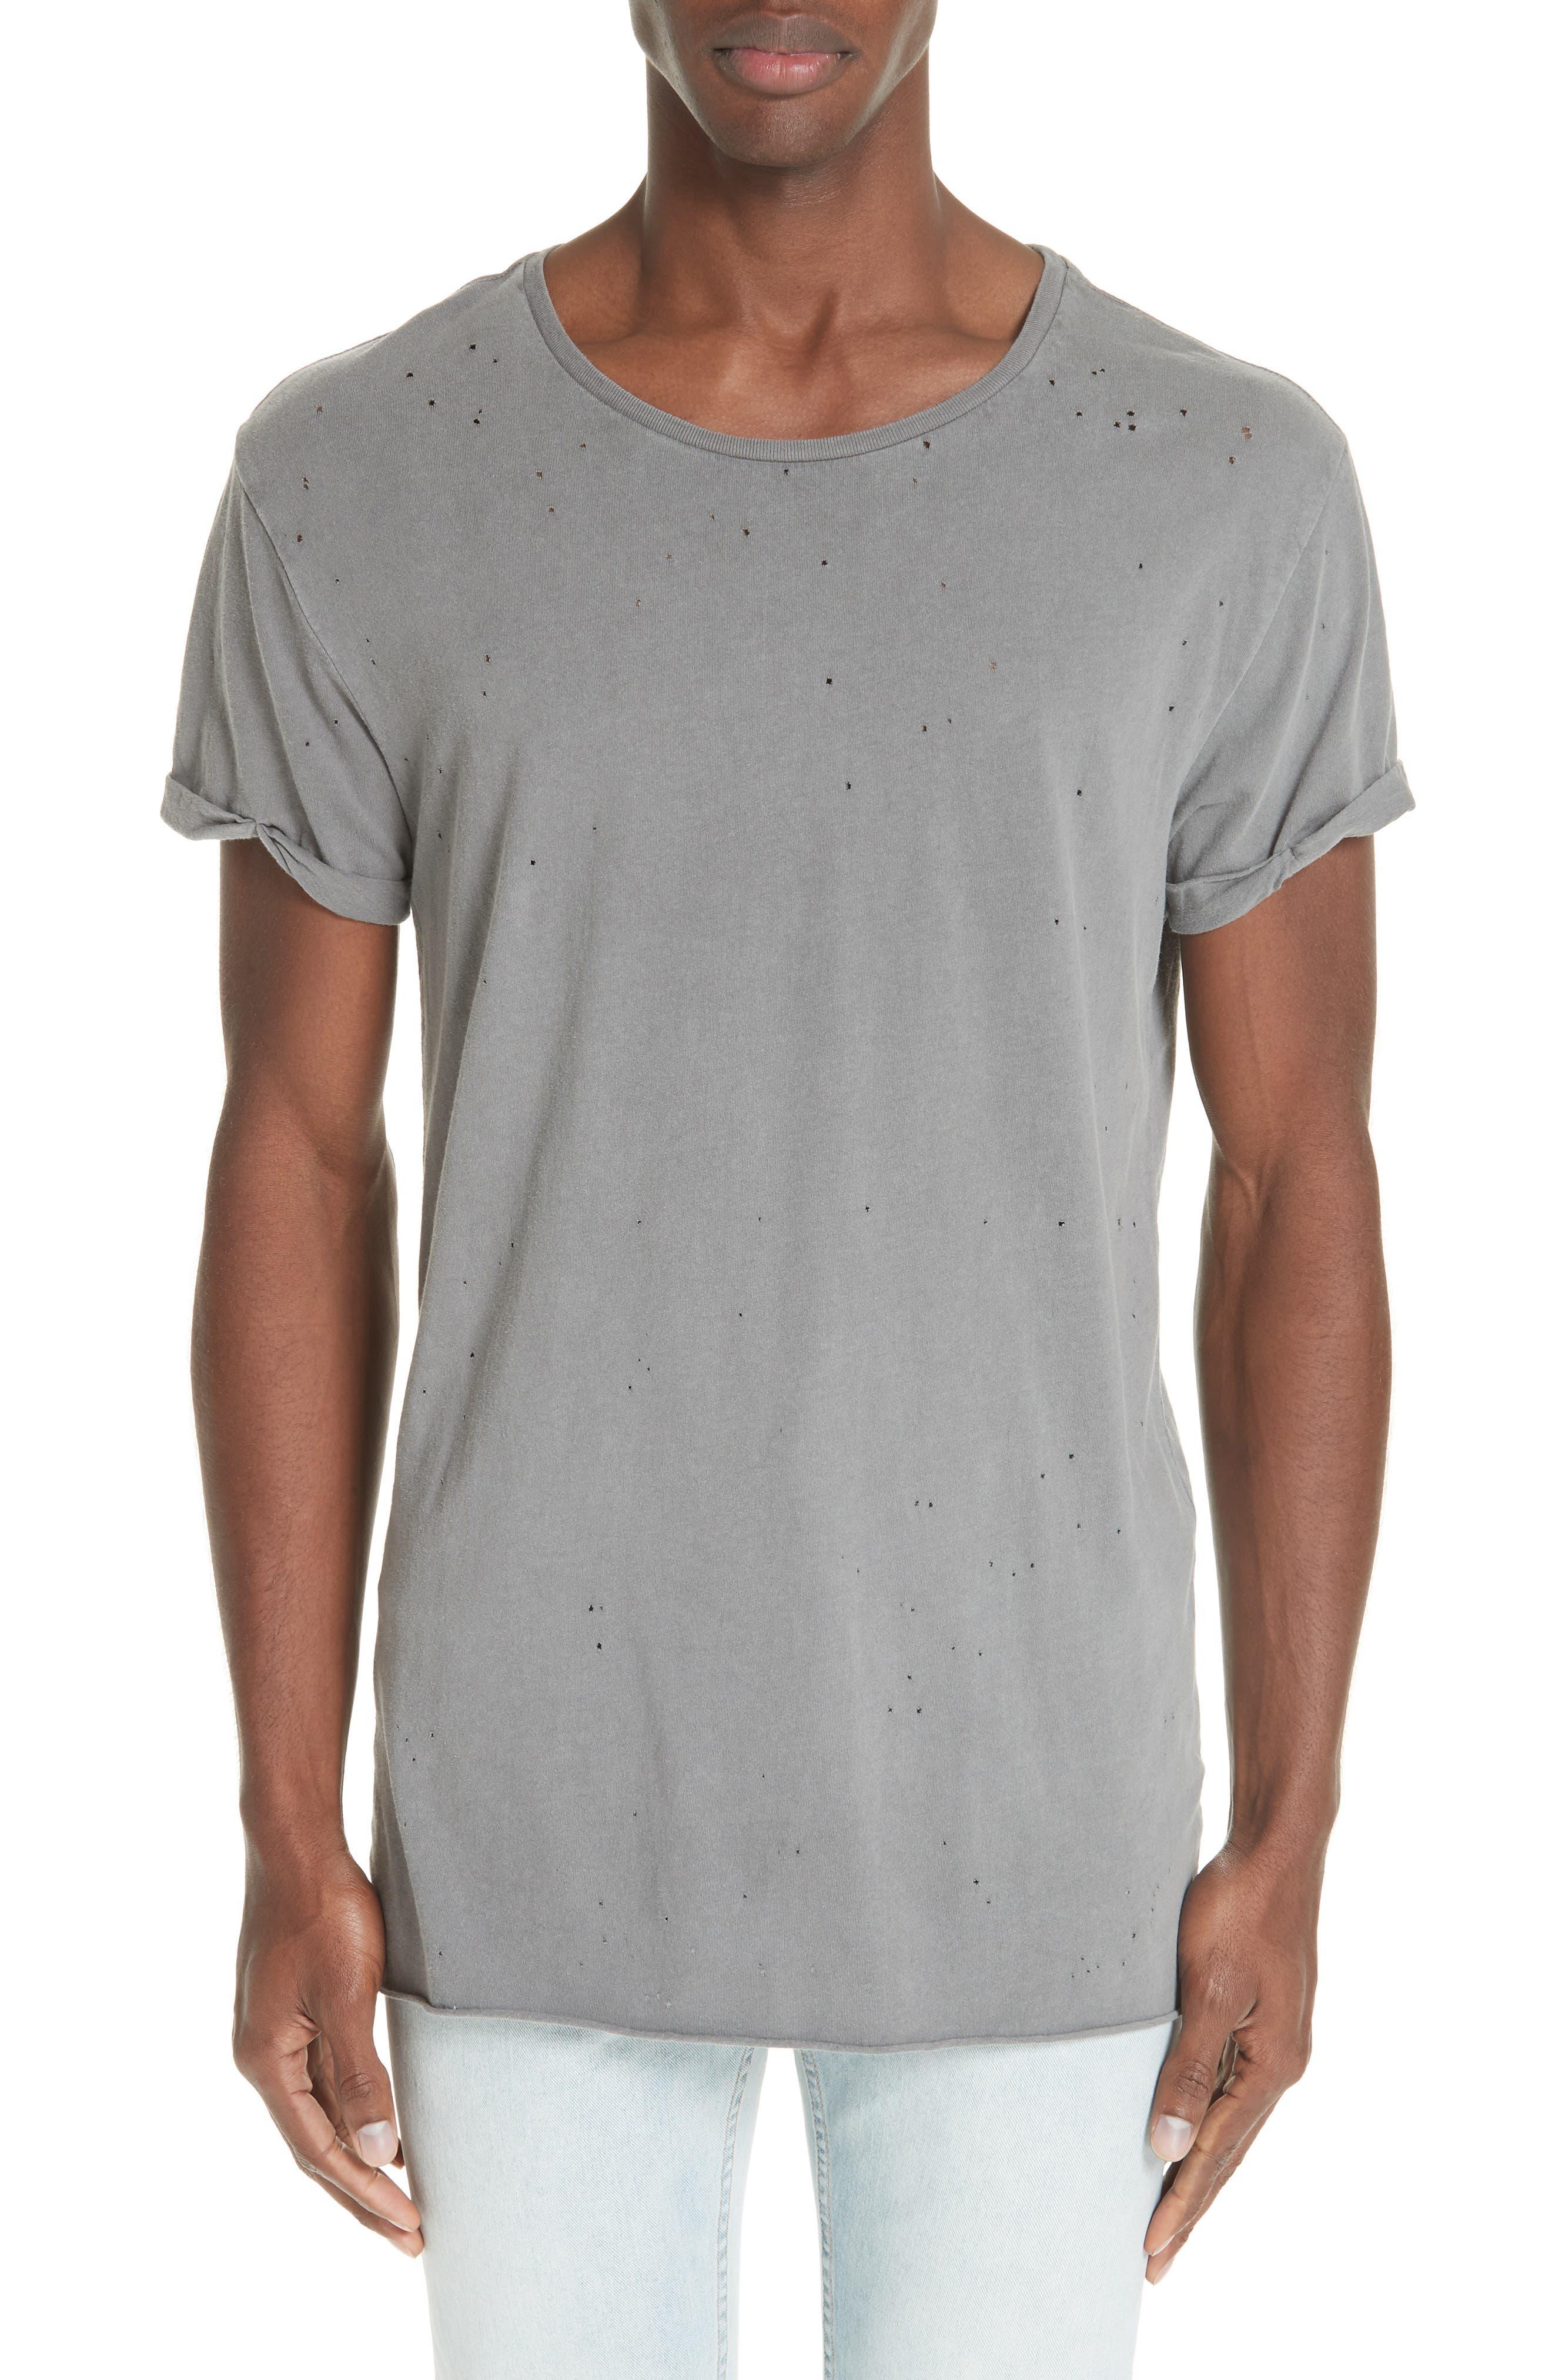 Kodeine Distressed T-Shirt,                             Main thumbnail 1, color,                             GREY